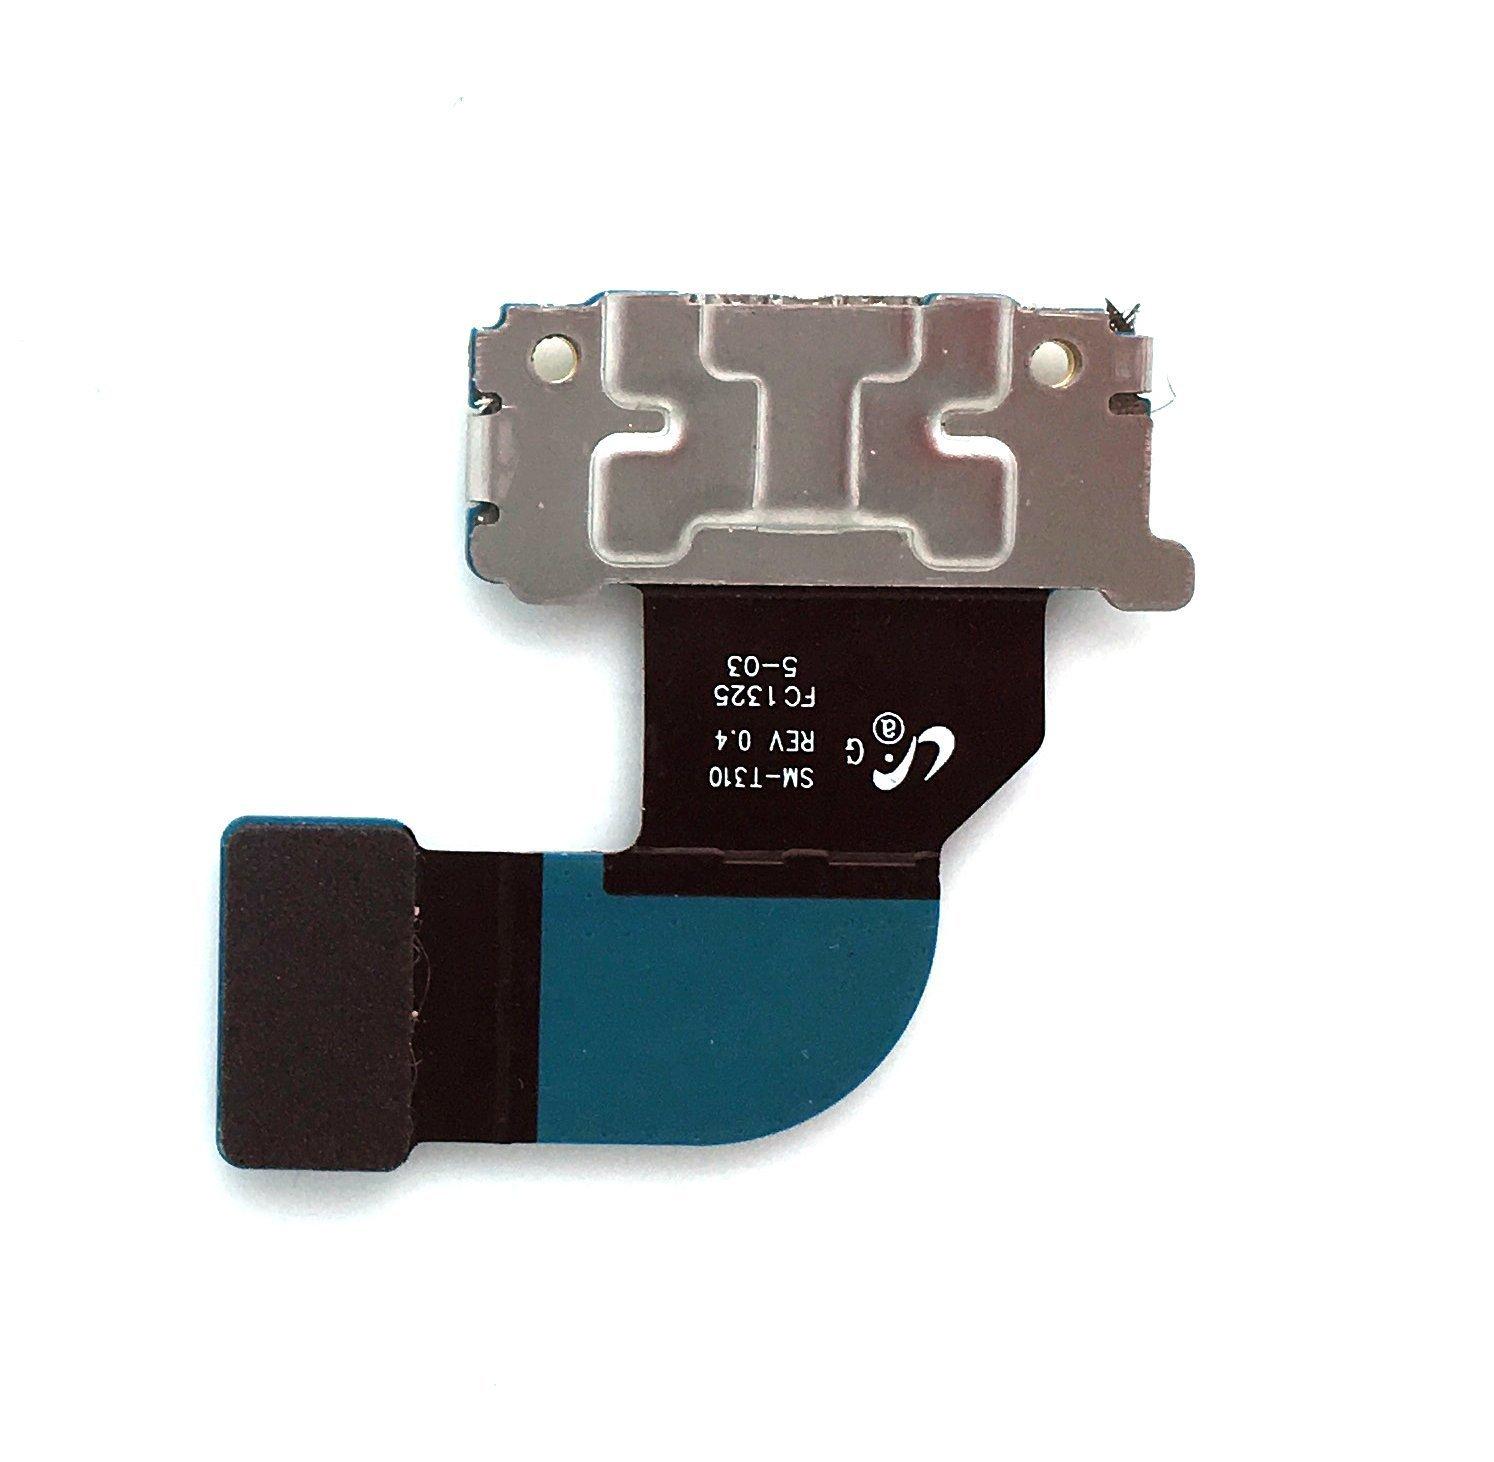 SBOS® Samsung Galaxy Tab 3 8.0 SM-T310 Charging Port Flex Cable Dock Connector USB Port Dock Repair Part